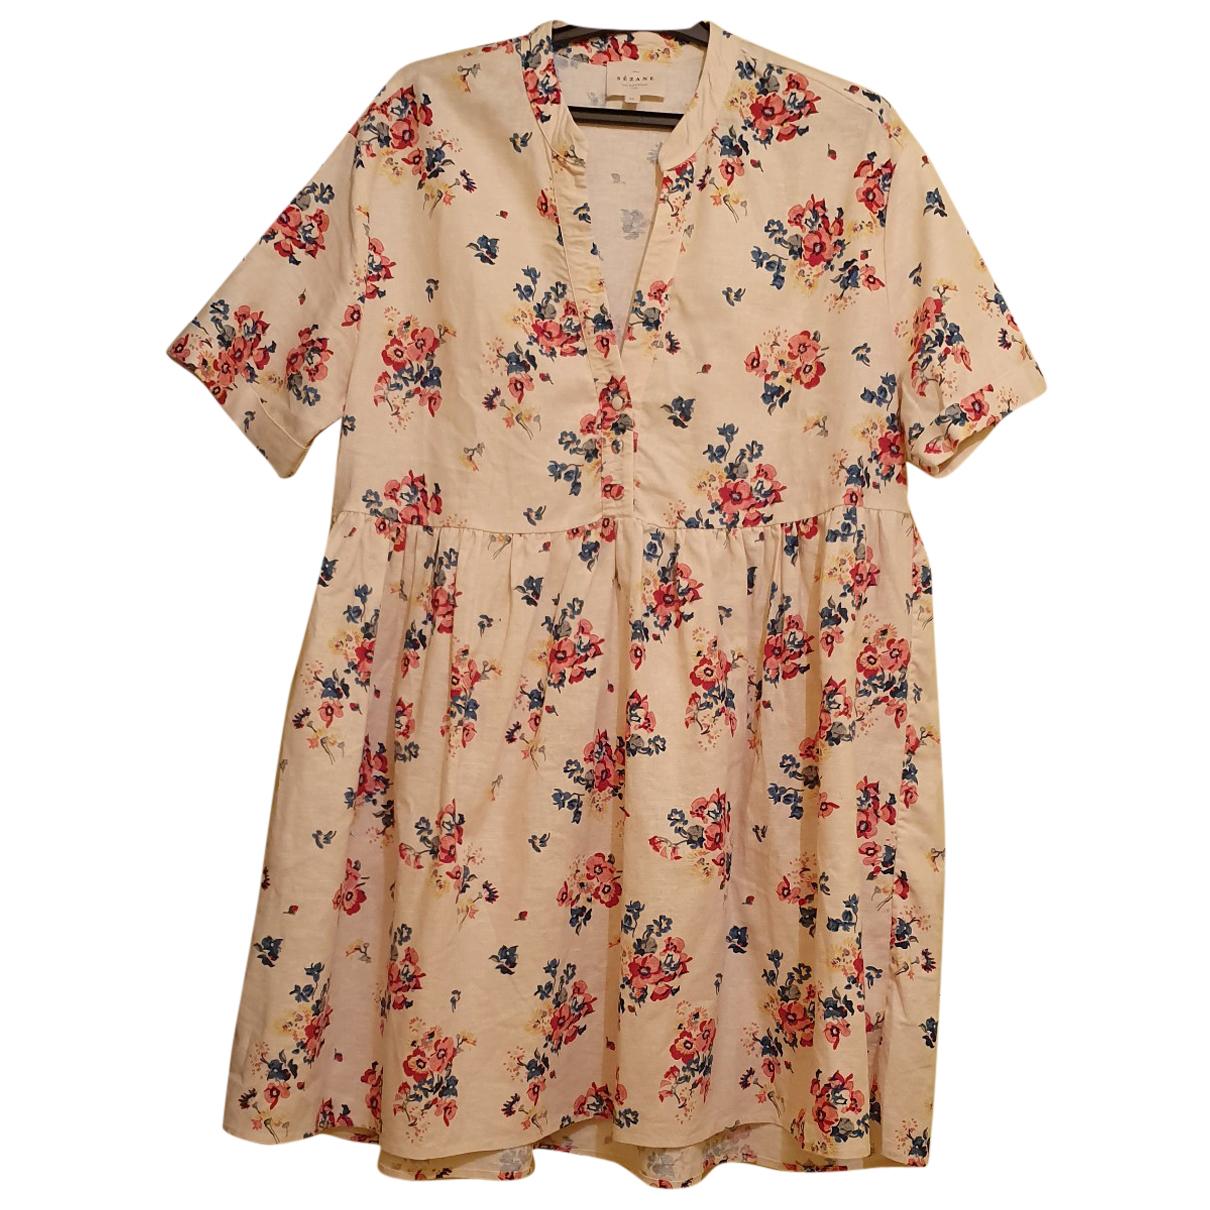 Sézane Spring Summer 2020 Multicolour Linen dress for Women 34 FR